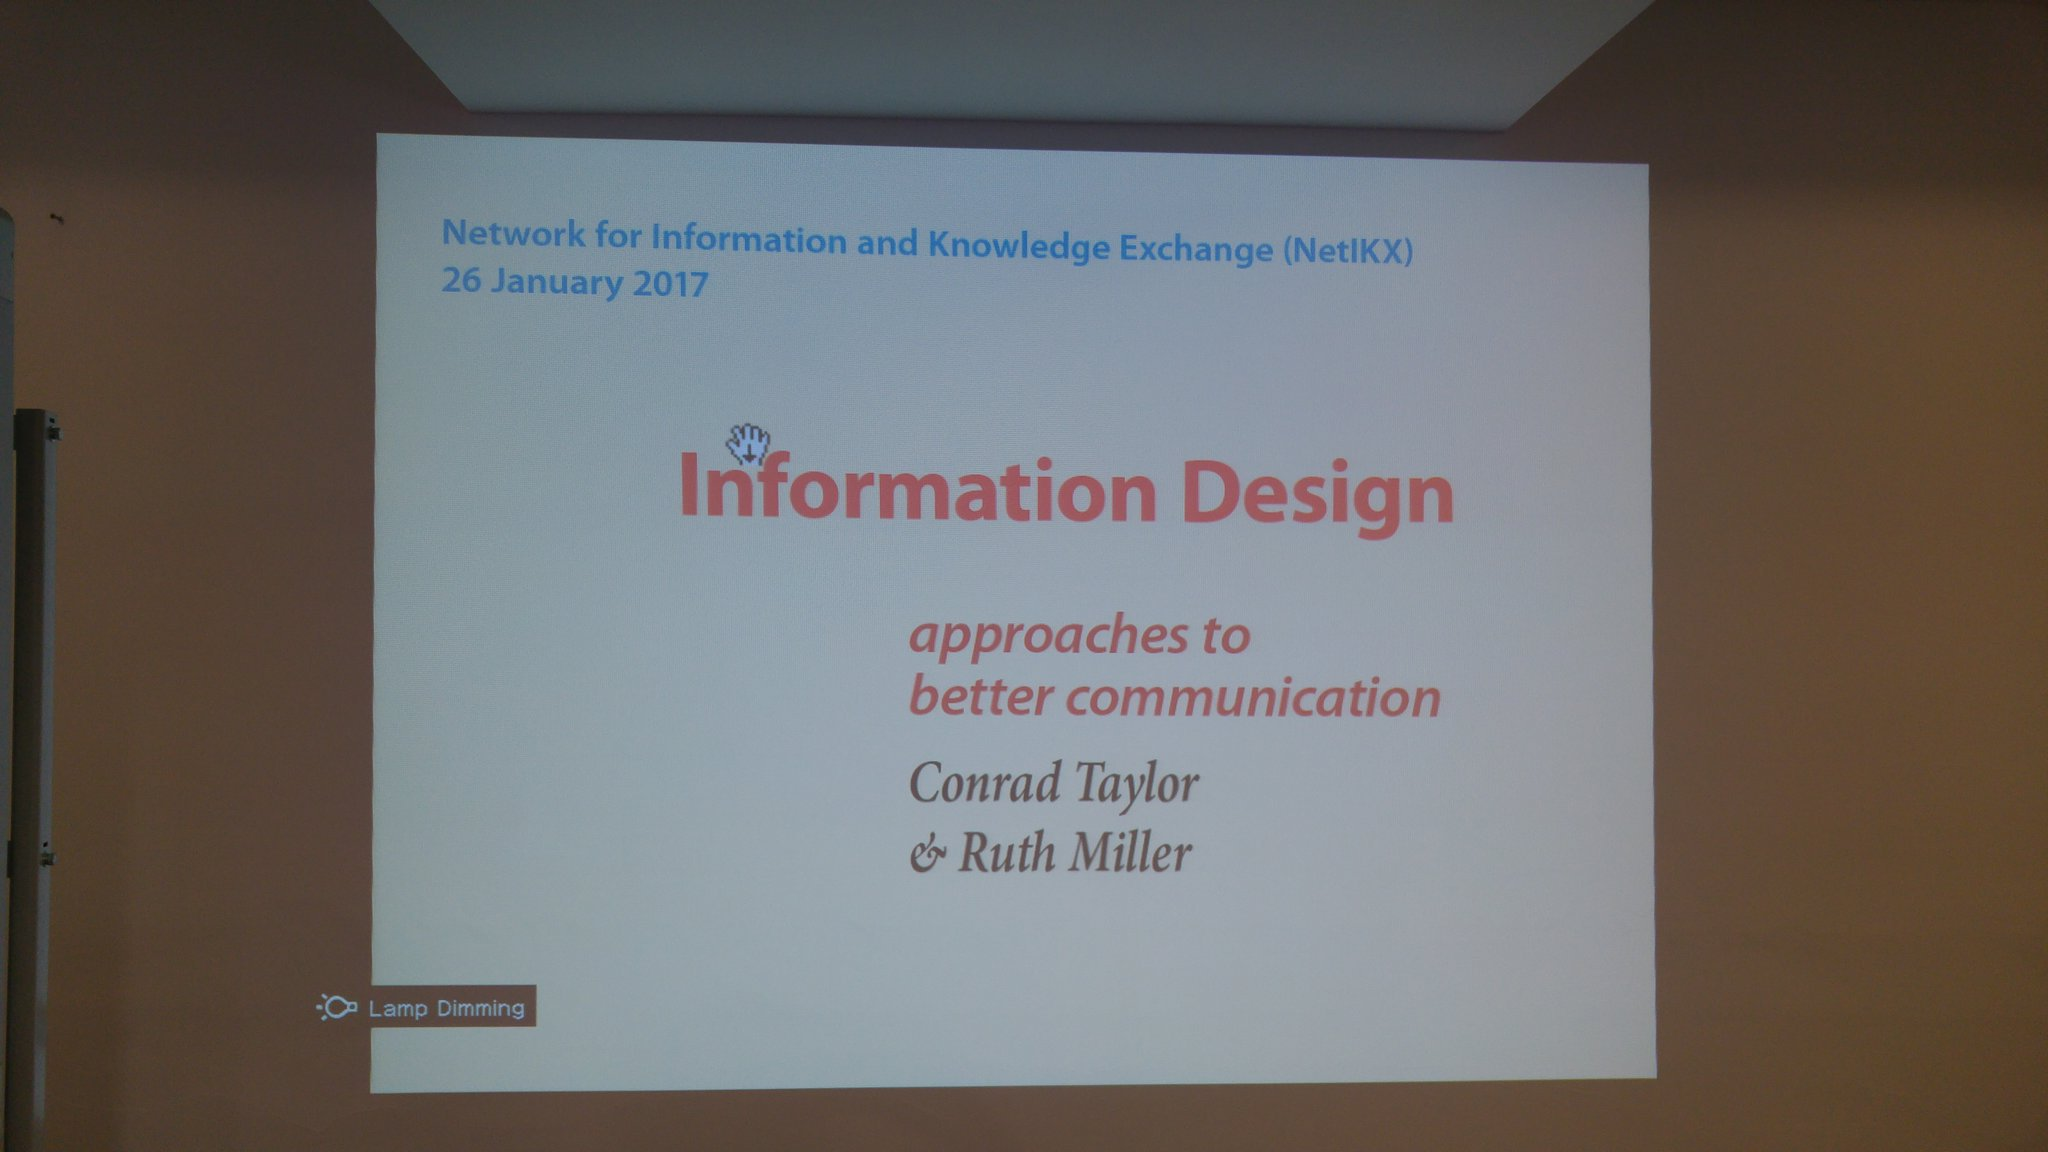 About to kick off #netikx83 on information design https://t.co/ILOdgPLKUN